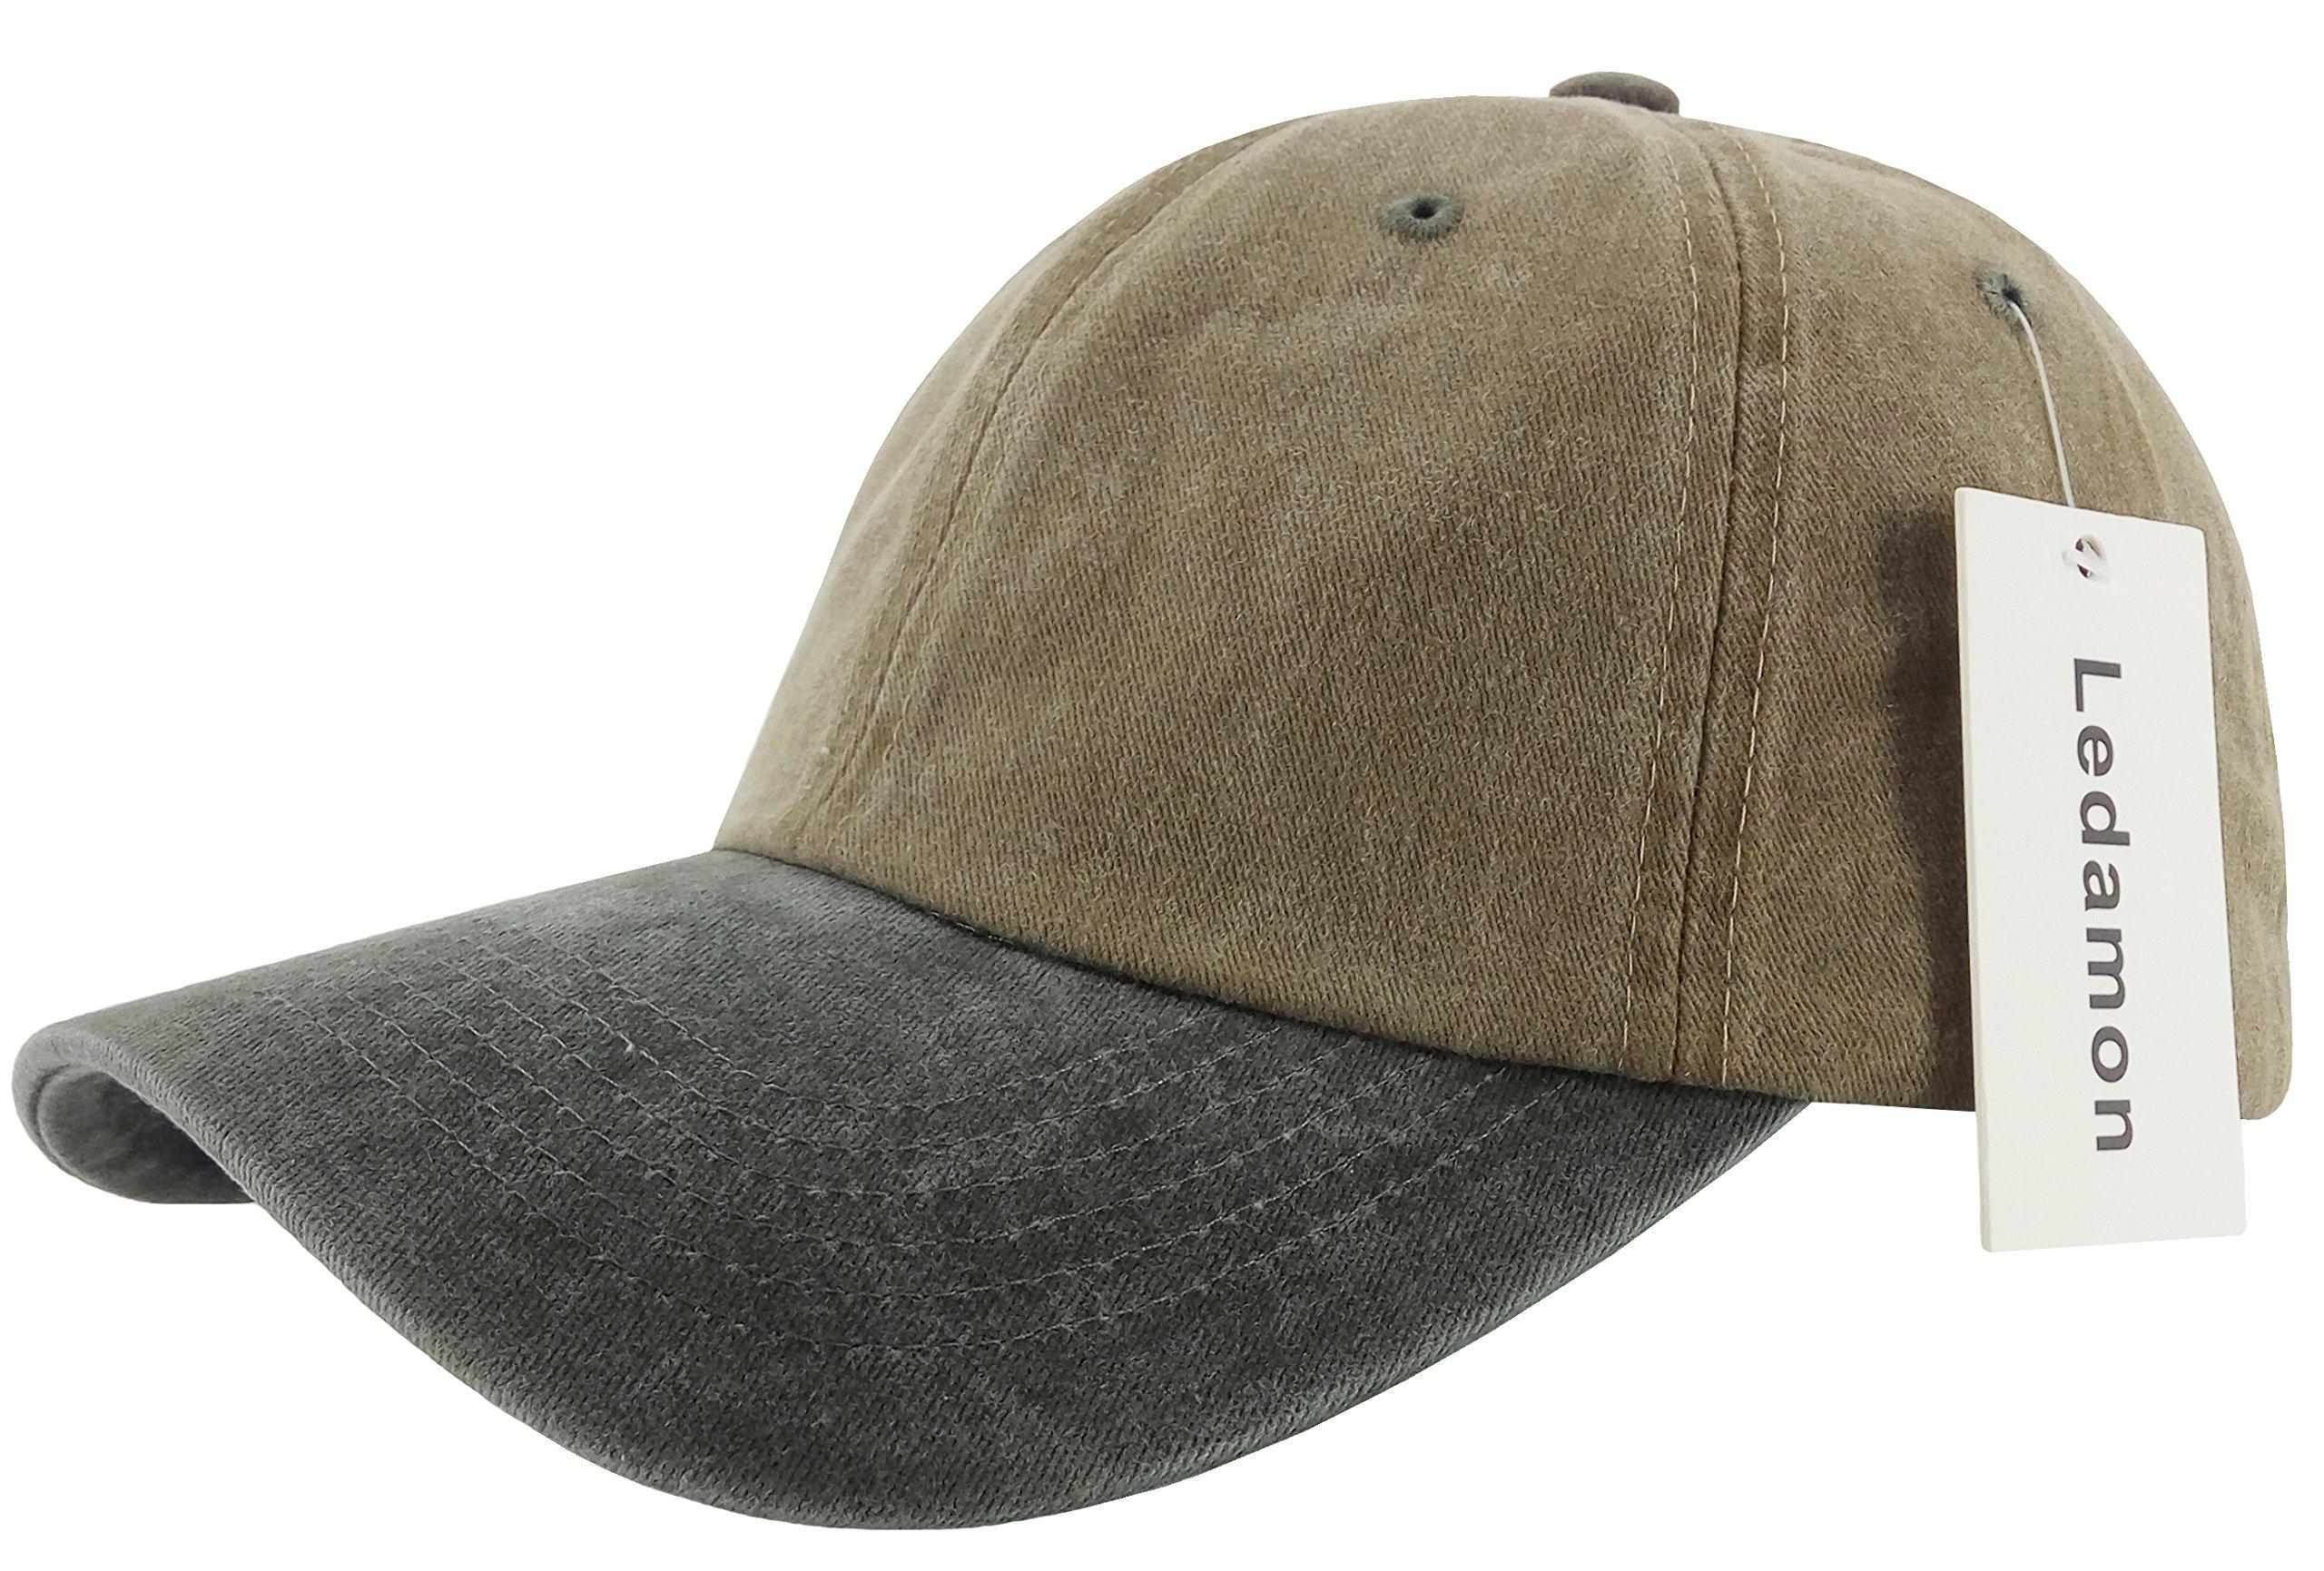 cca10a1c9 Galleon - Ledamon Baseball Cap Vintage Dad Hat Plain Polo Washed ...